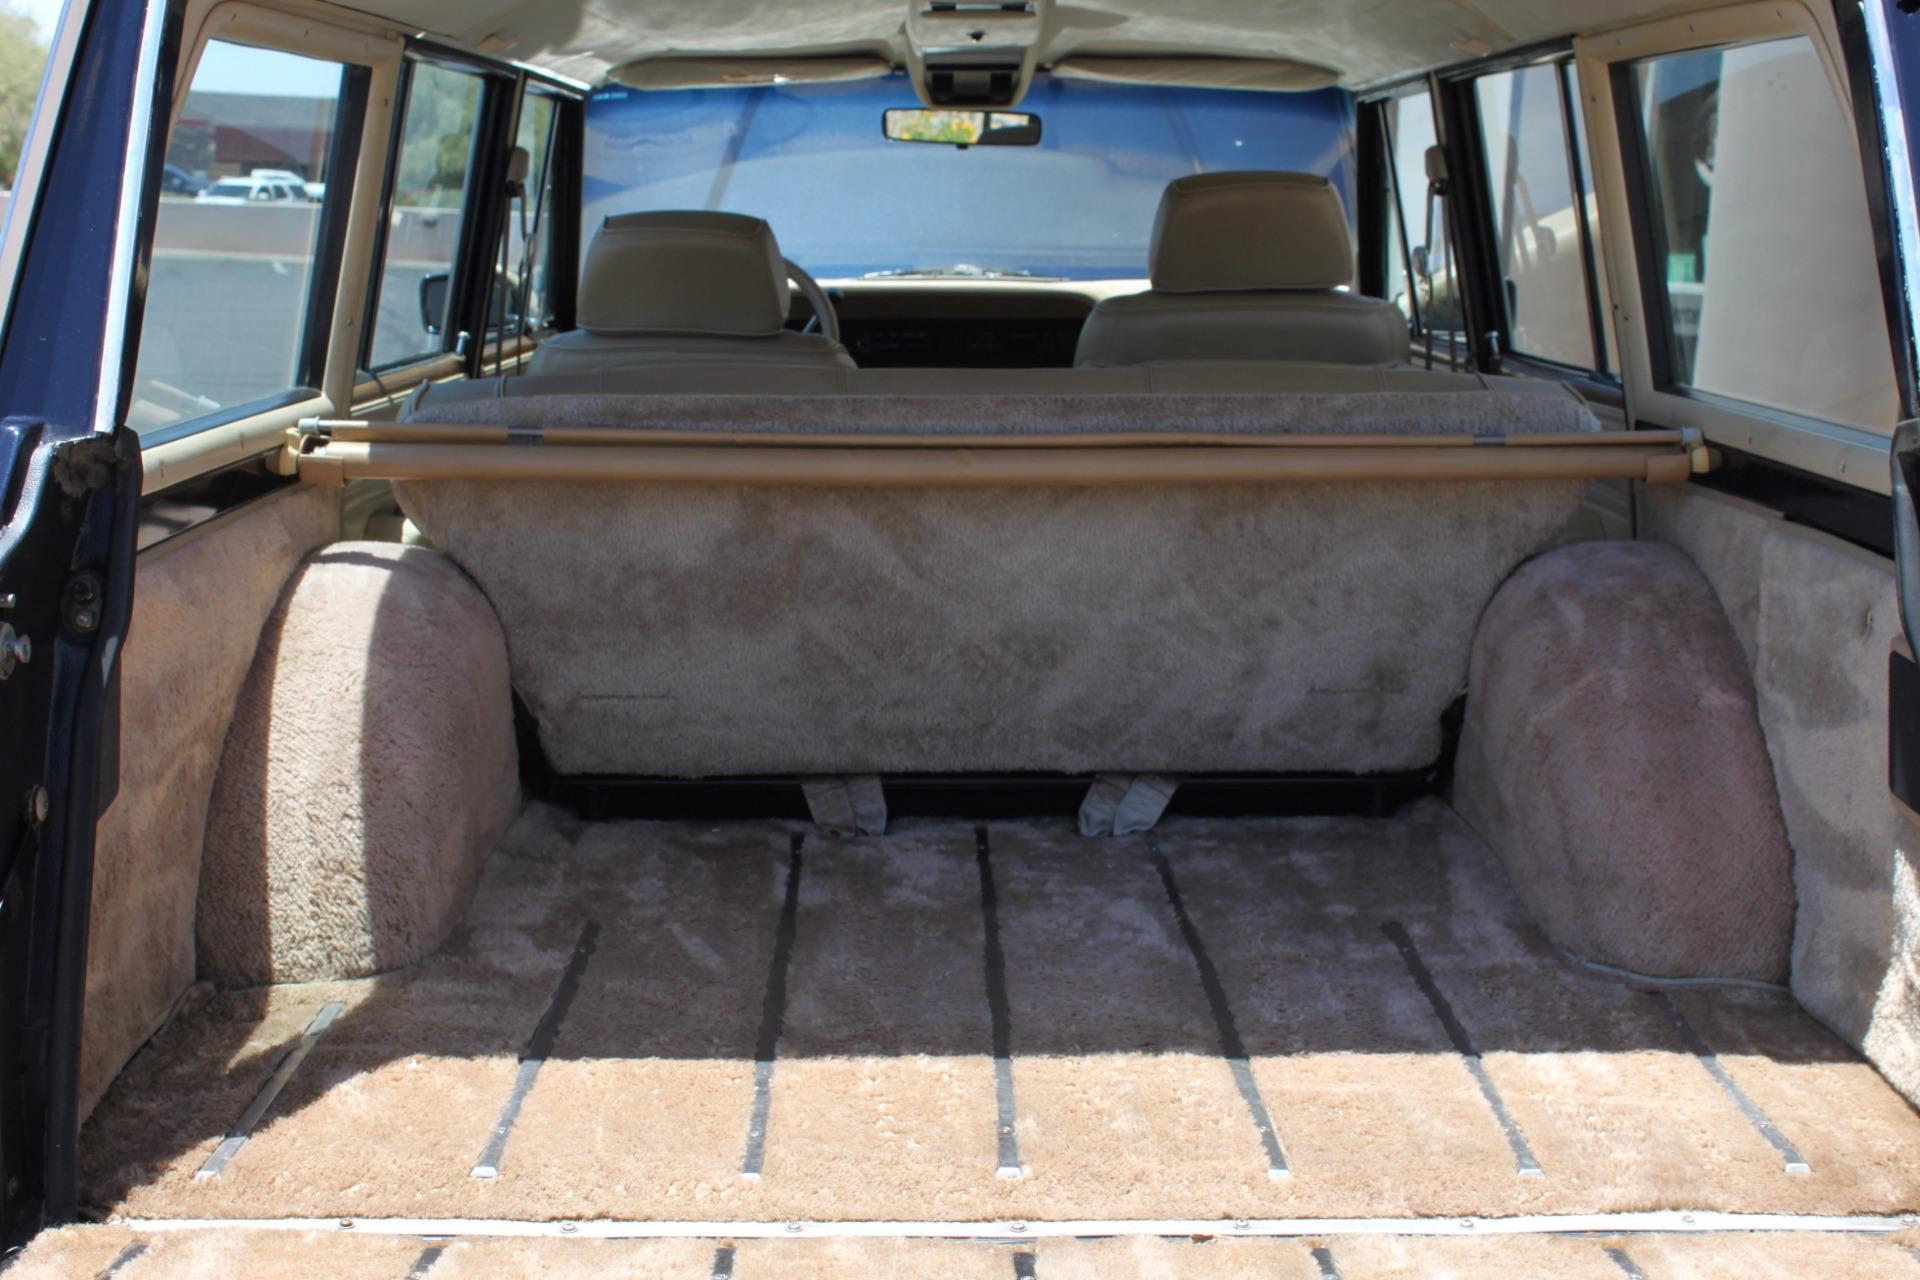 Used-1990-Jeep-Grand-Wagoneer-4X4-Land-Cruiser